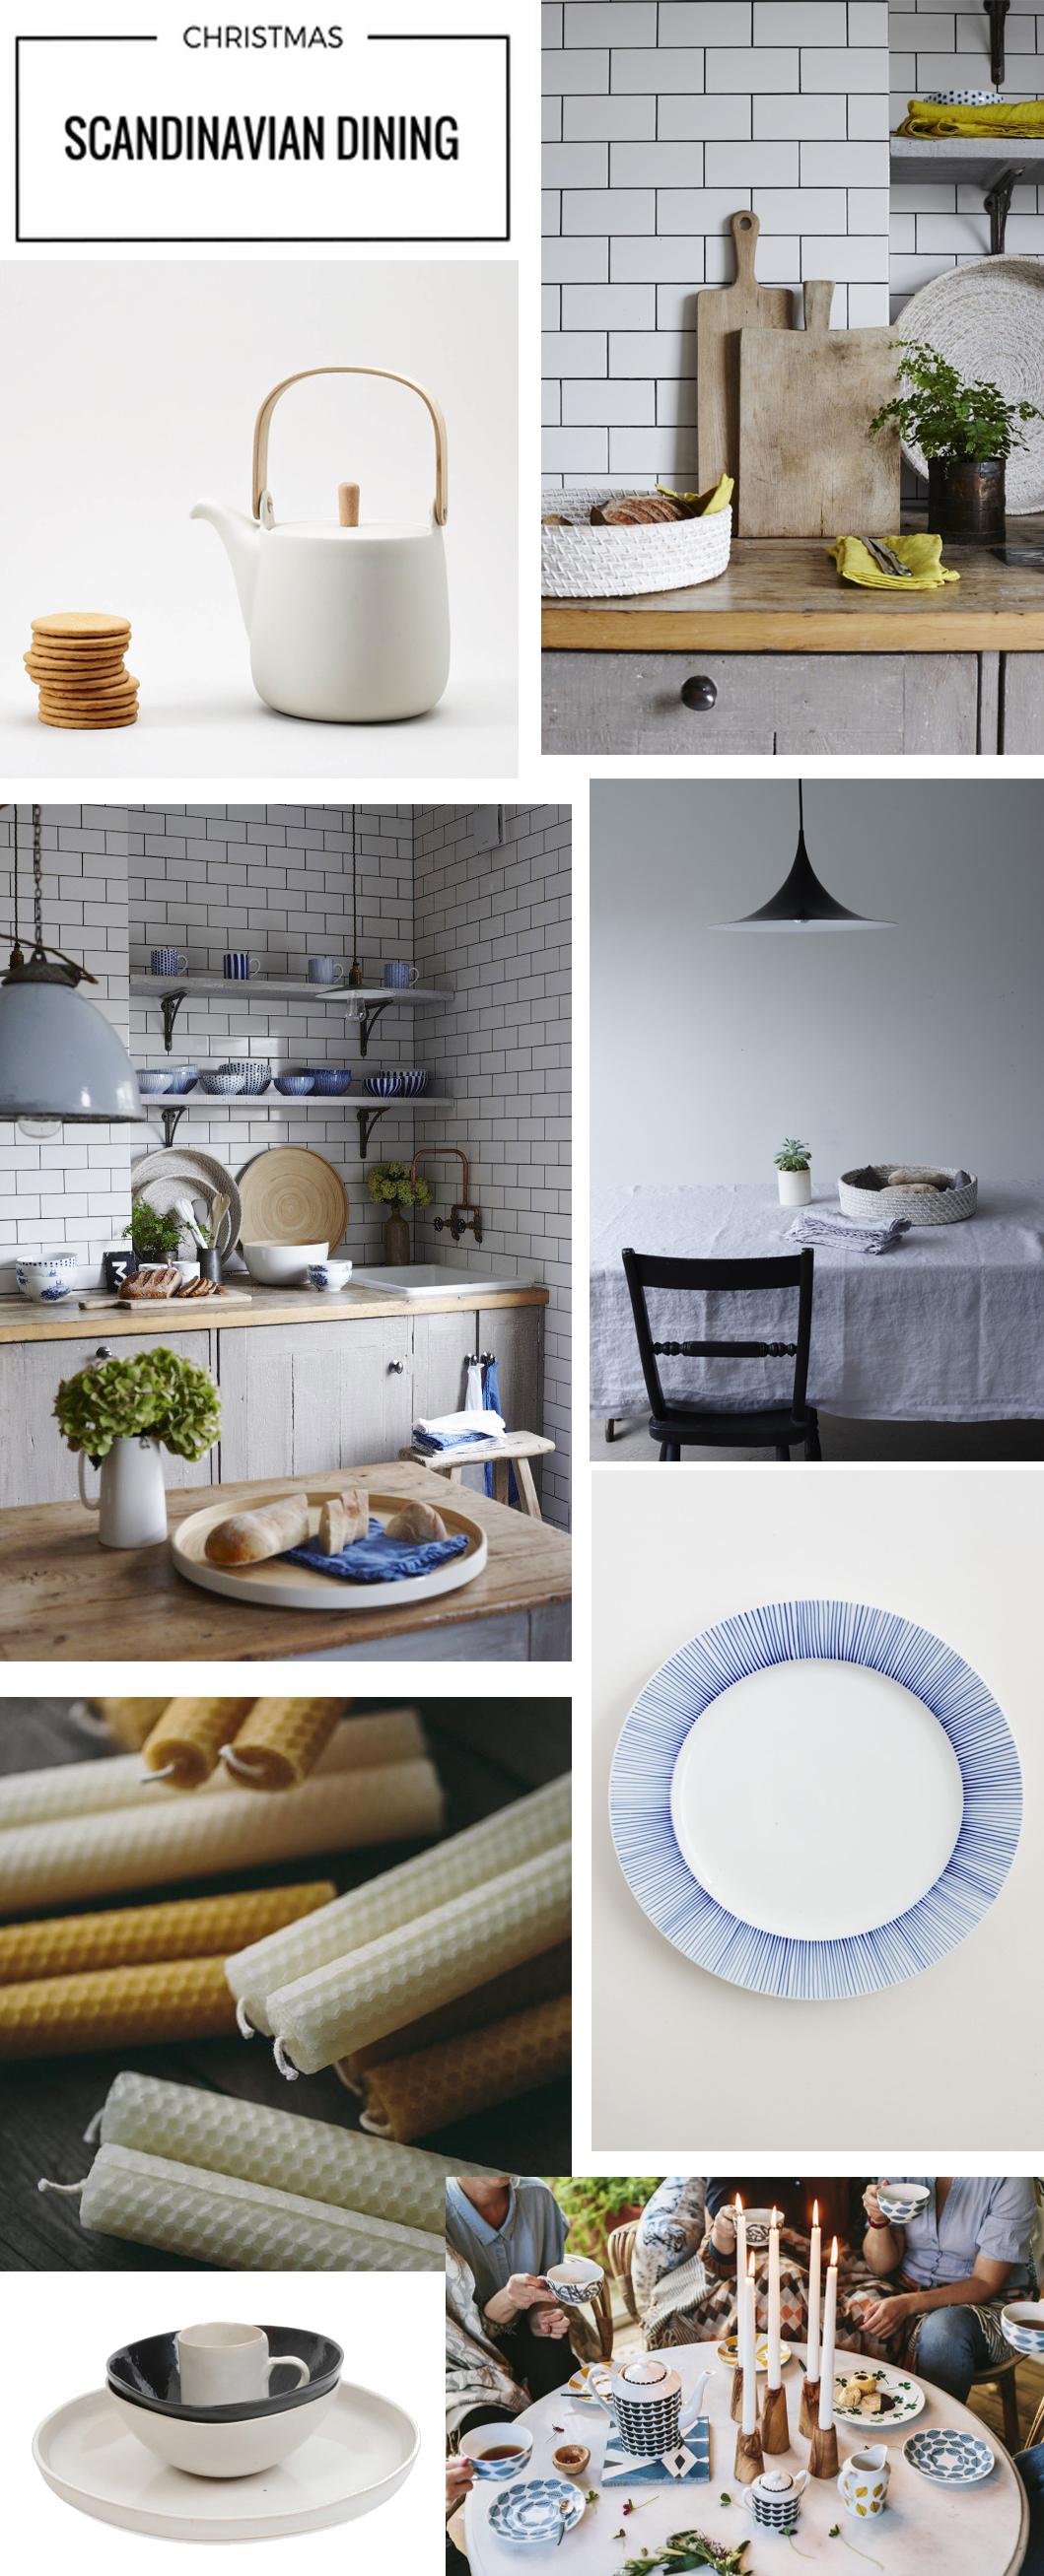 Scandinavian Christmas dining | ALSO Home | Scandinavian tableware | Apartment Apothecary